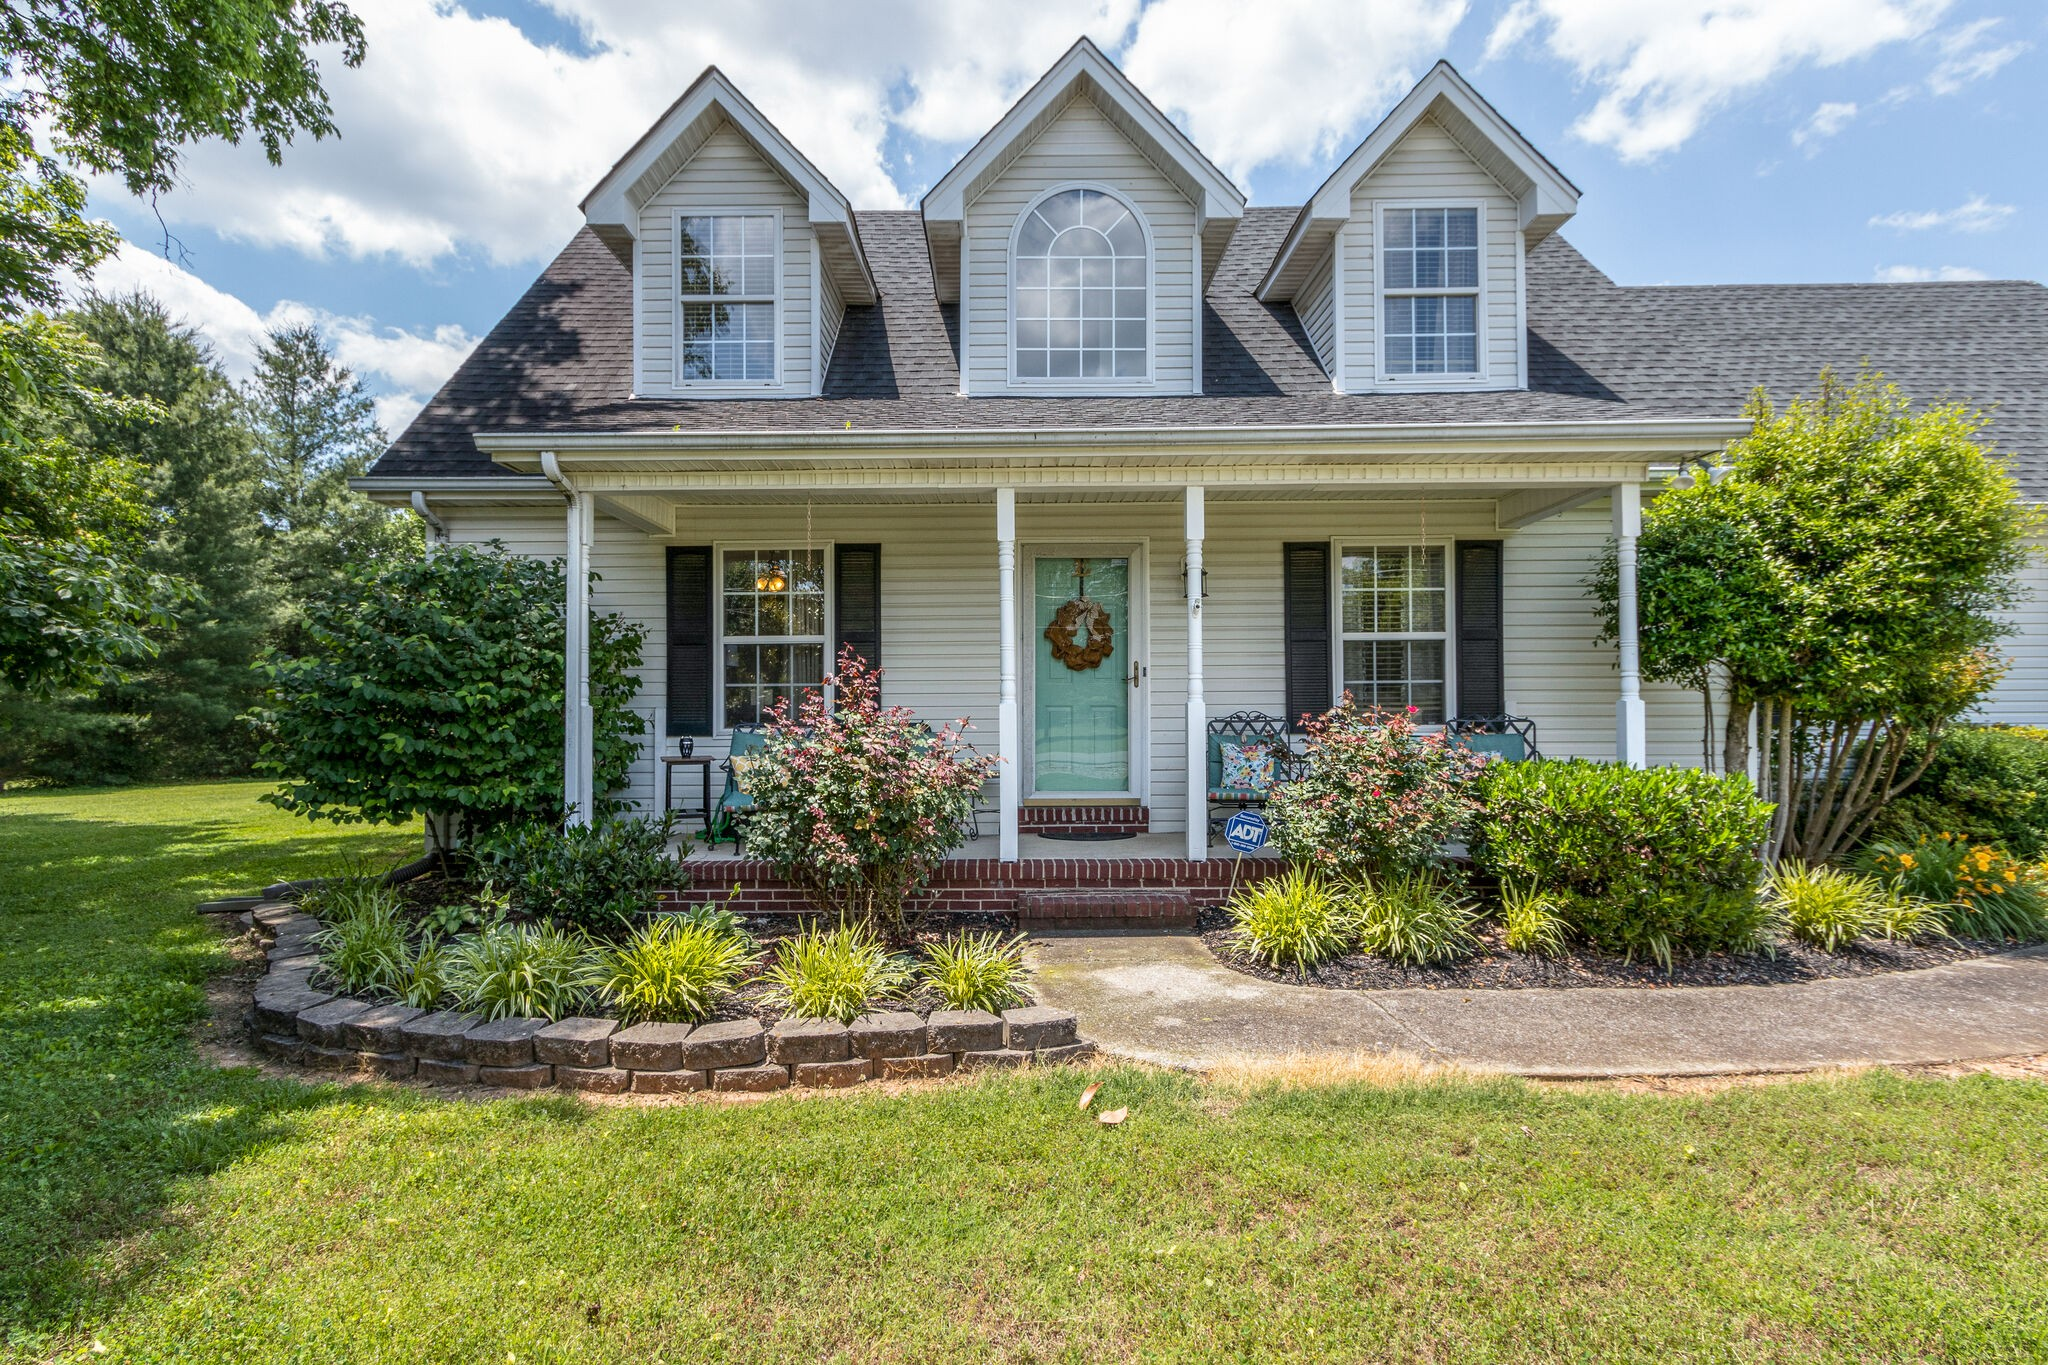 107 Remington Dr Property Photo - Lascassas, TN real estate listing